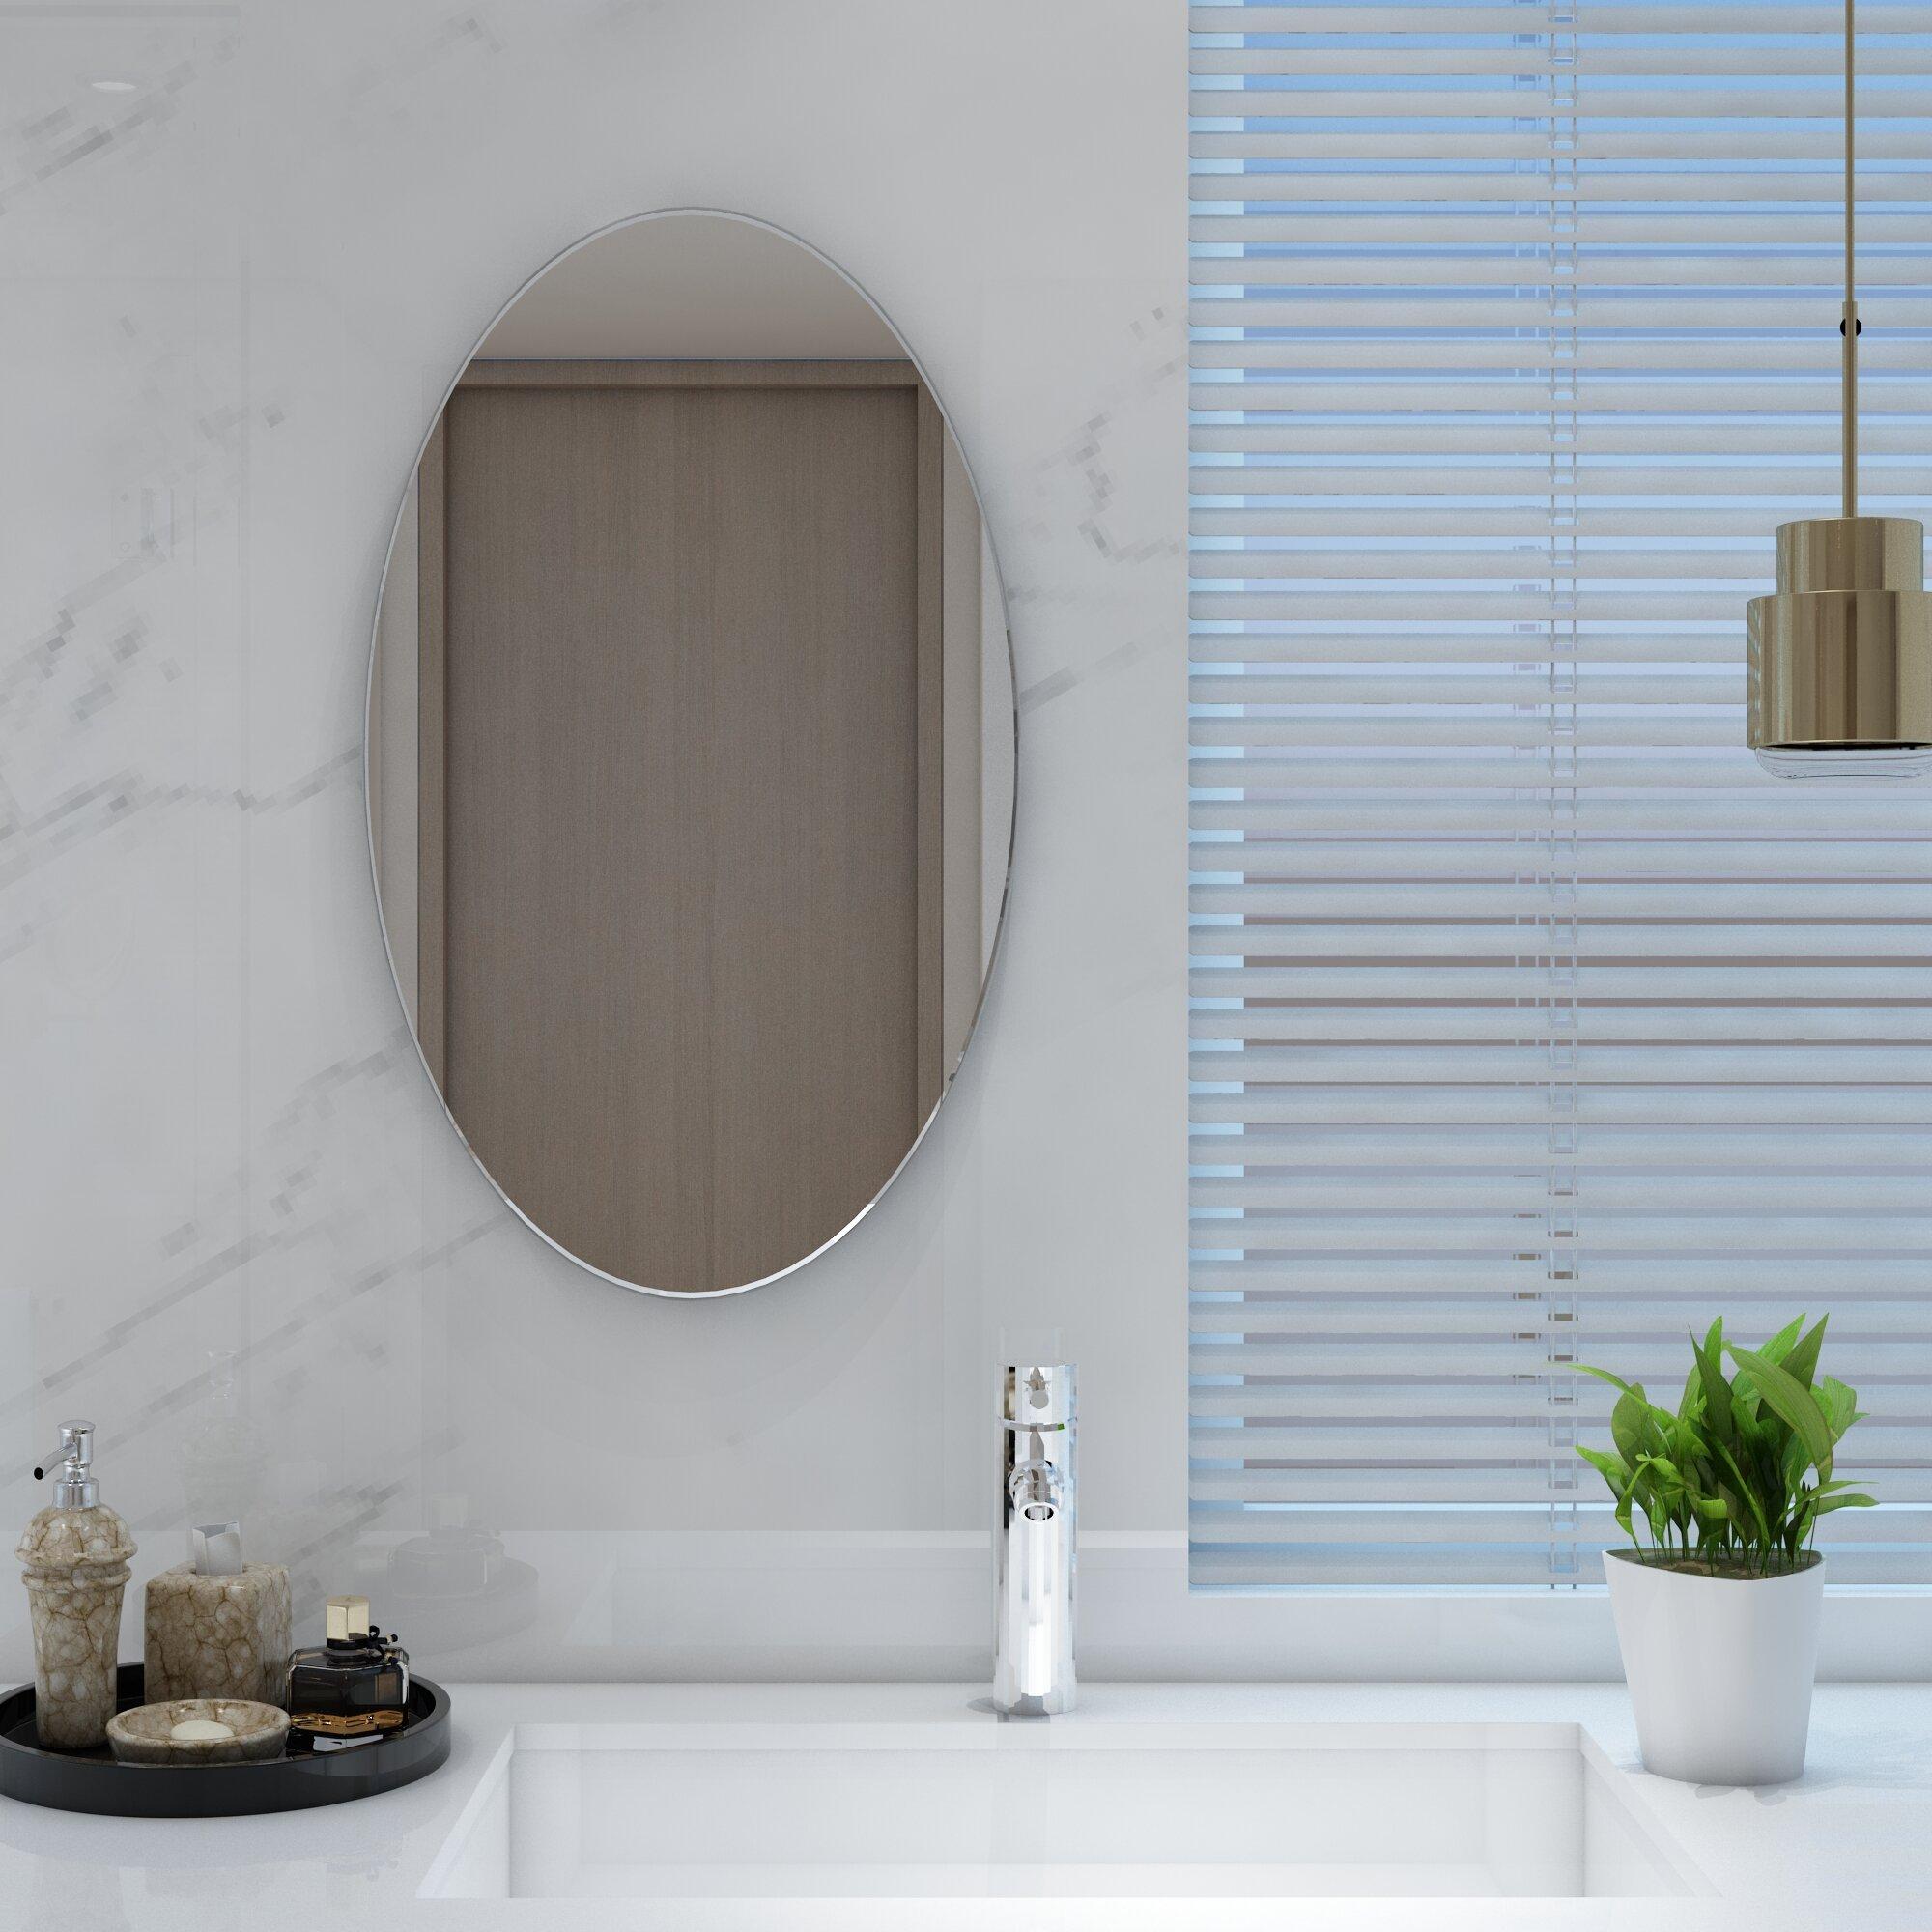 Ebern Designs Akhtari Frameless Wall Bathroom Vanity Mirror Reviews Wayfair